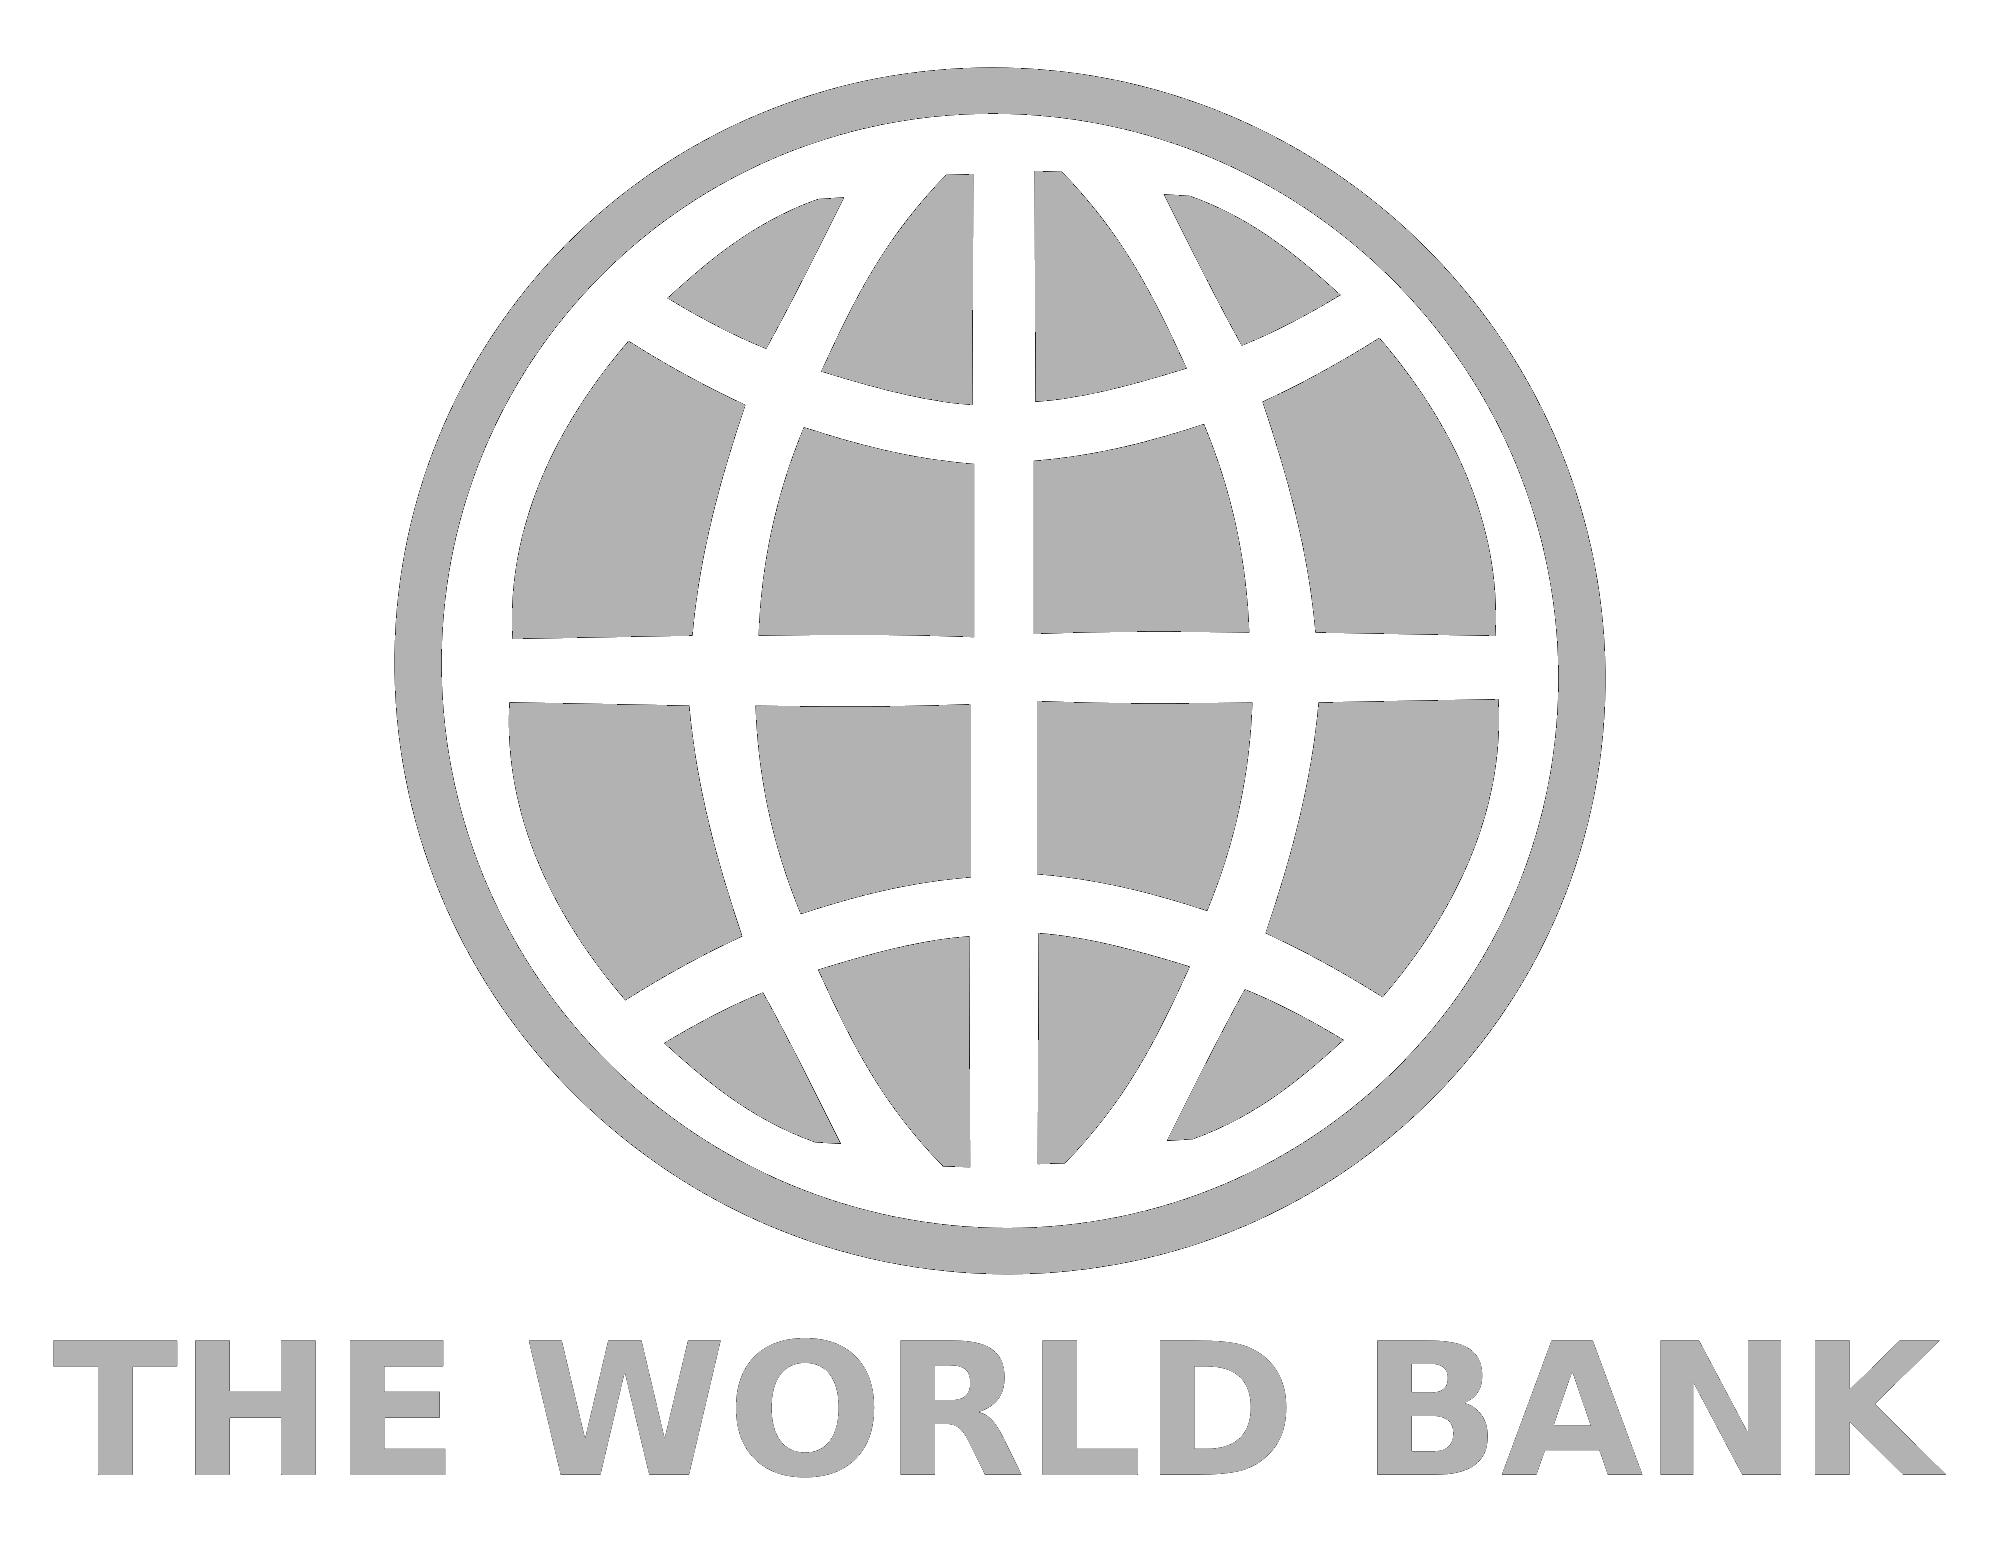 Logo_The_World_Bank.png